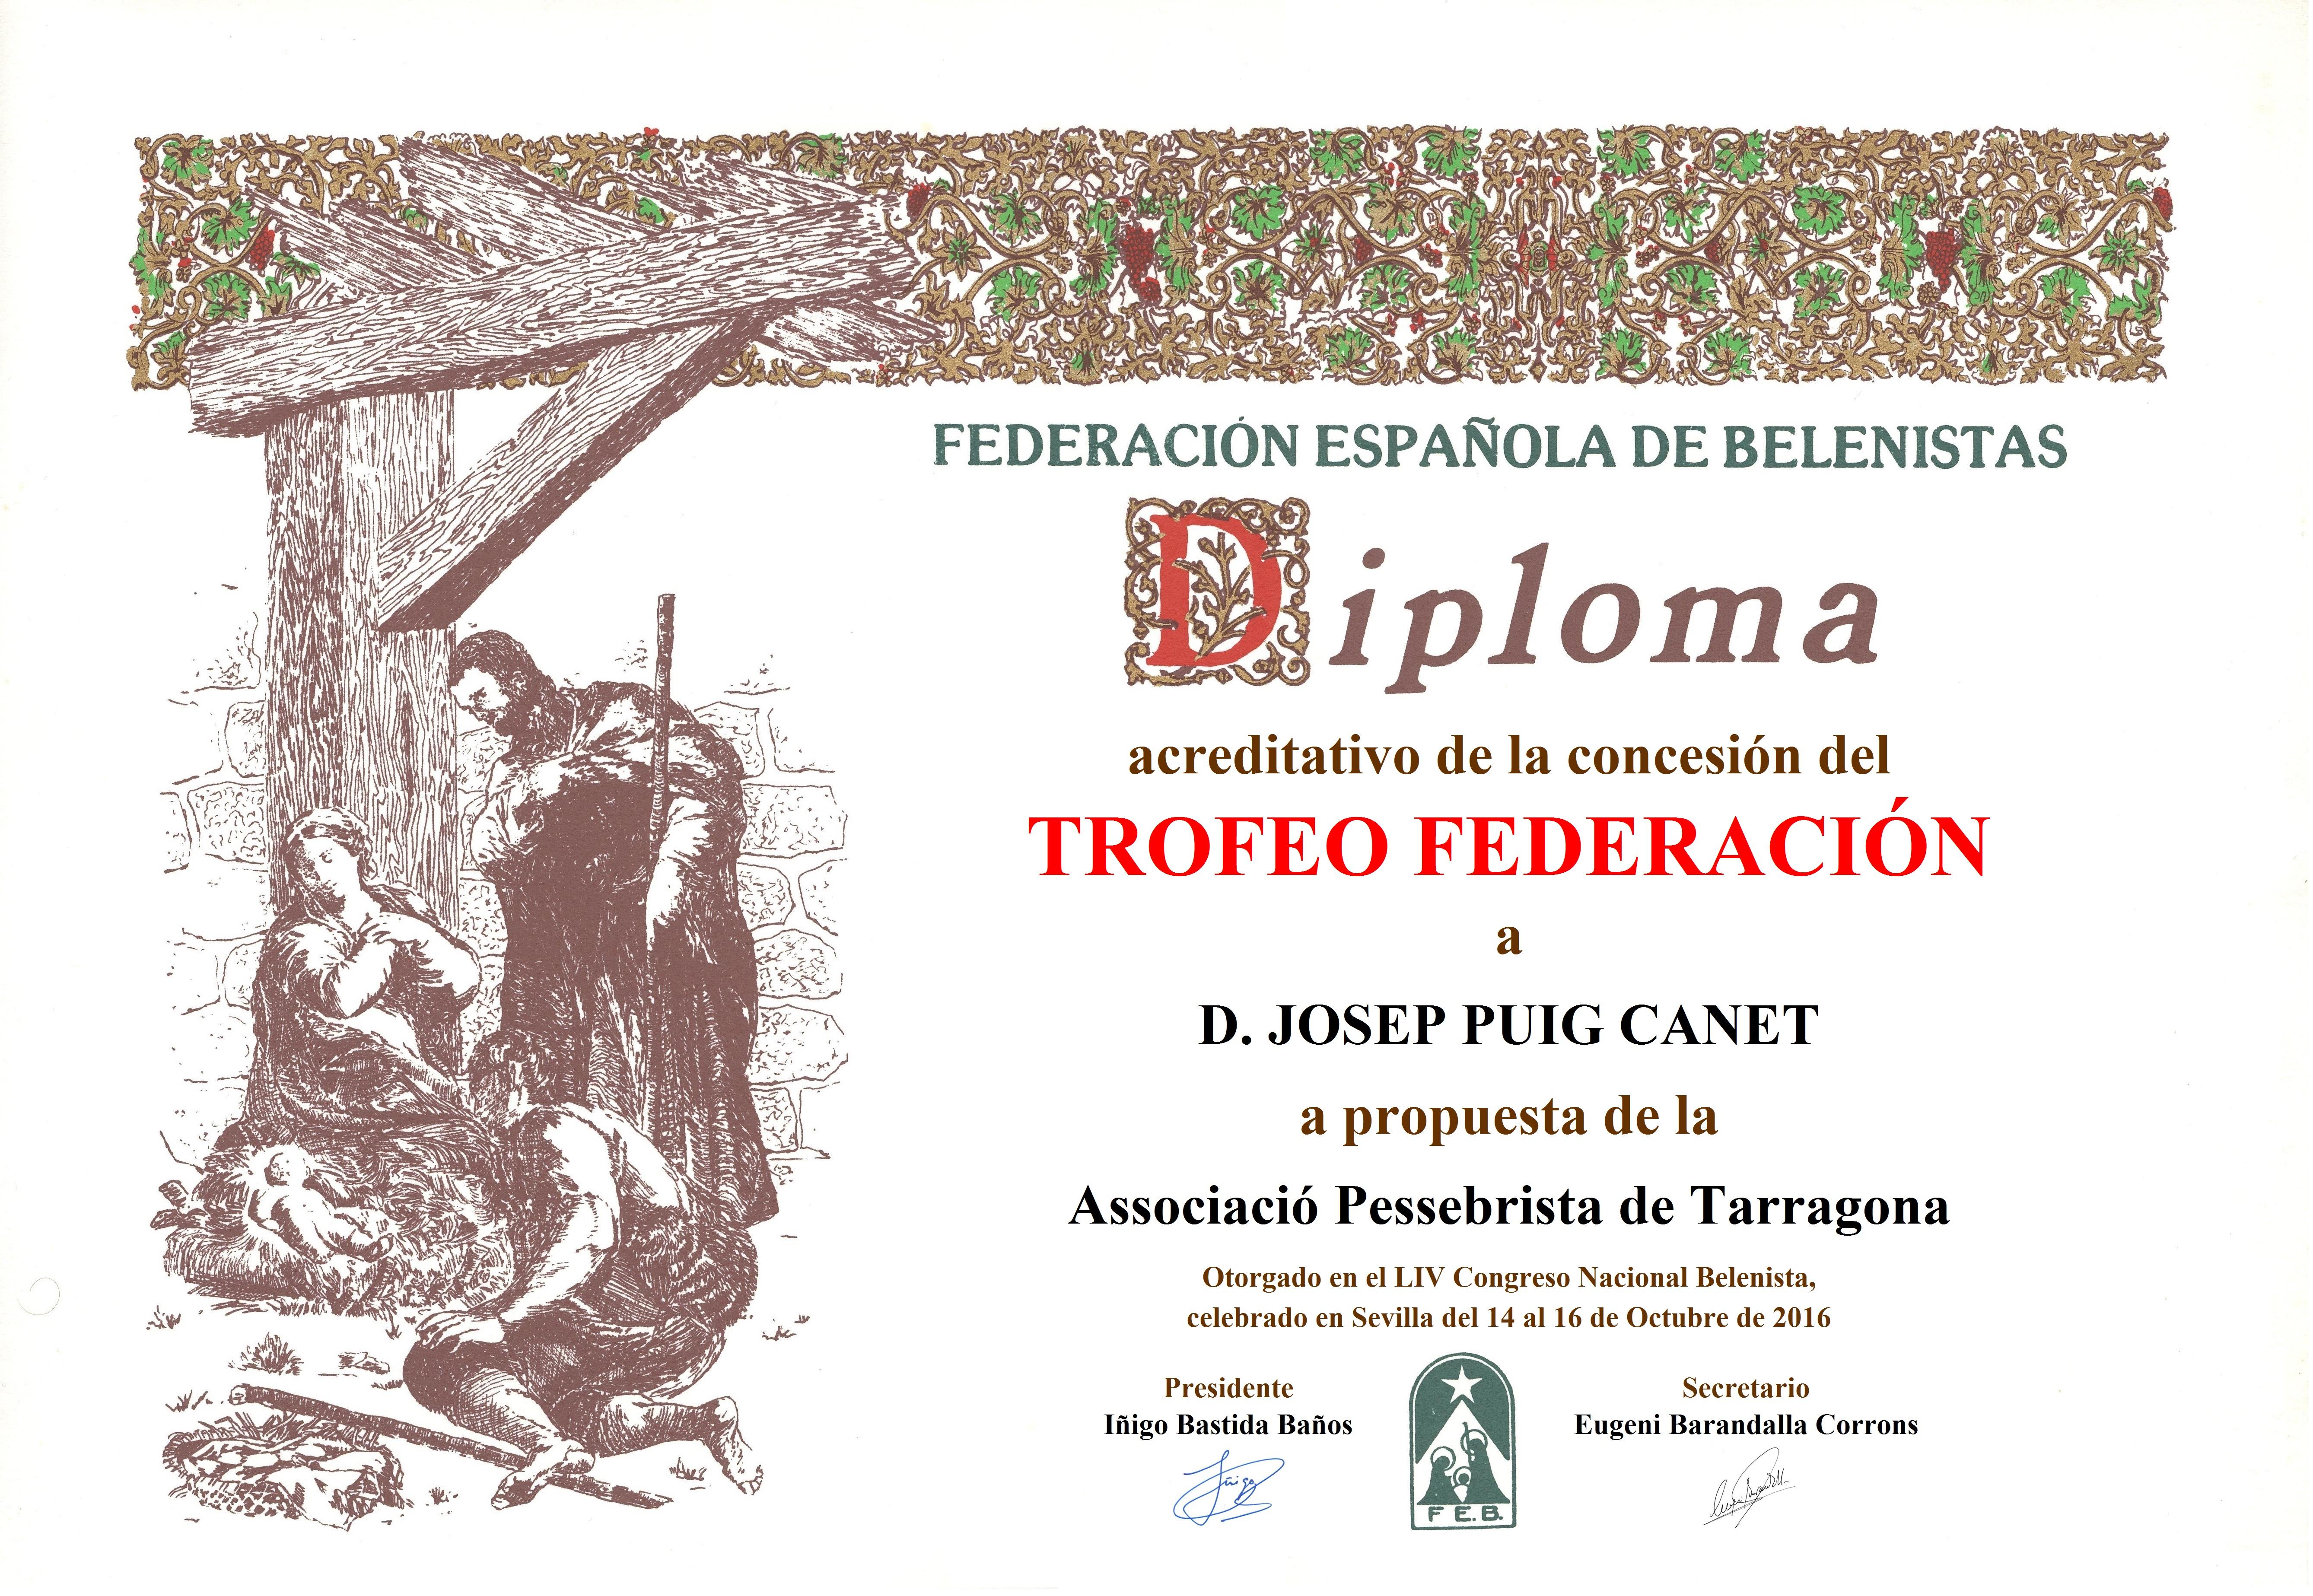 Josep Puig Canet - Diploma Trofeo FEB 2016